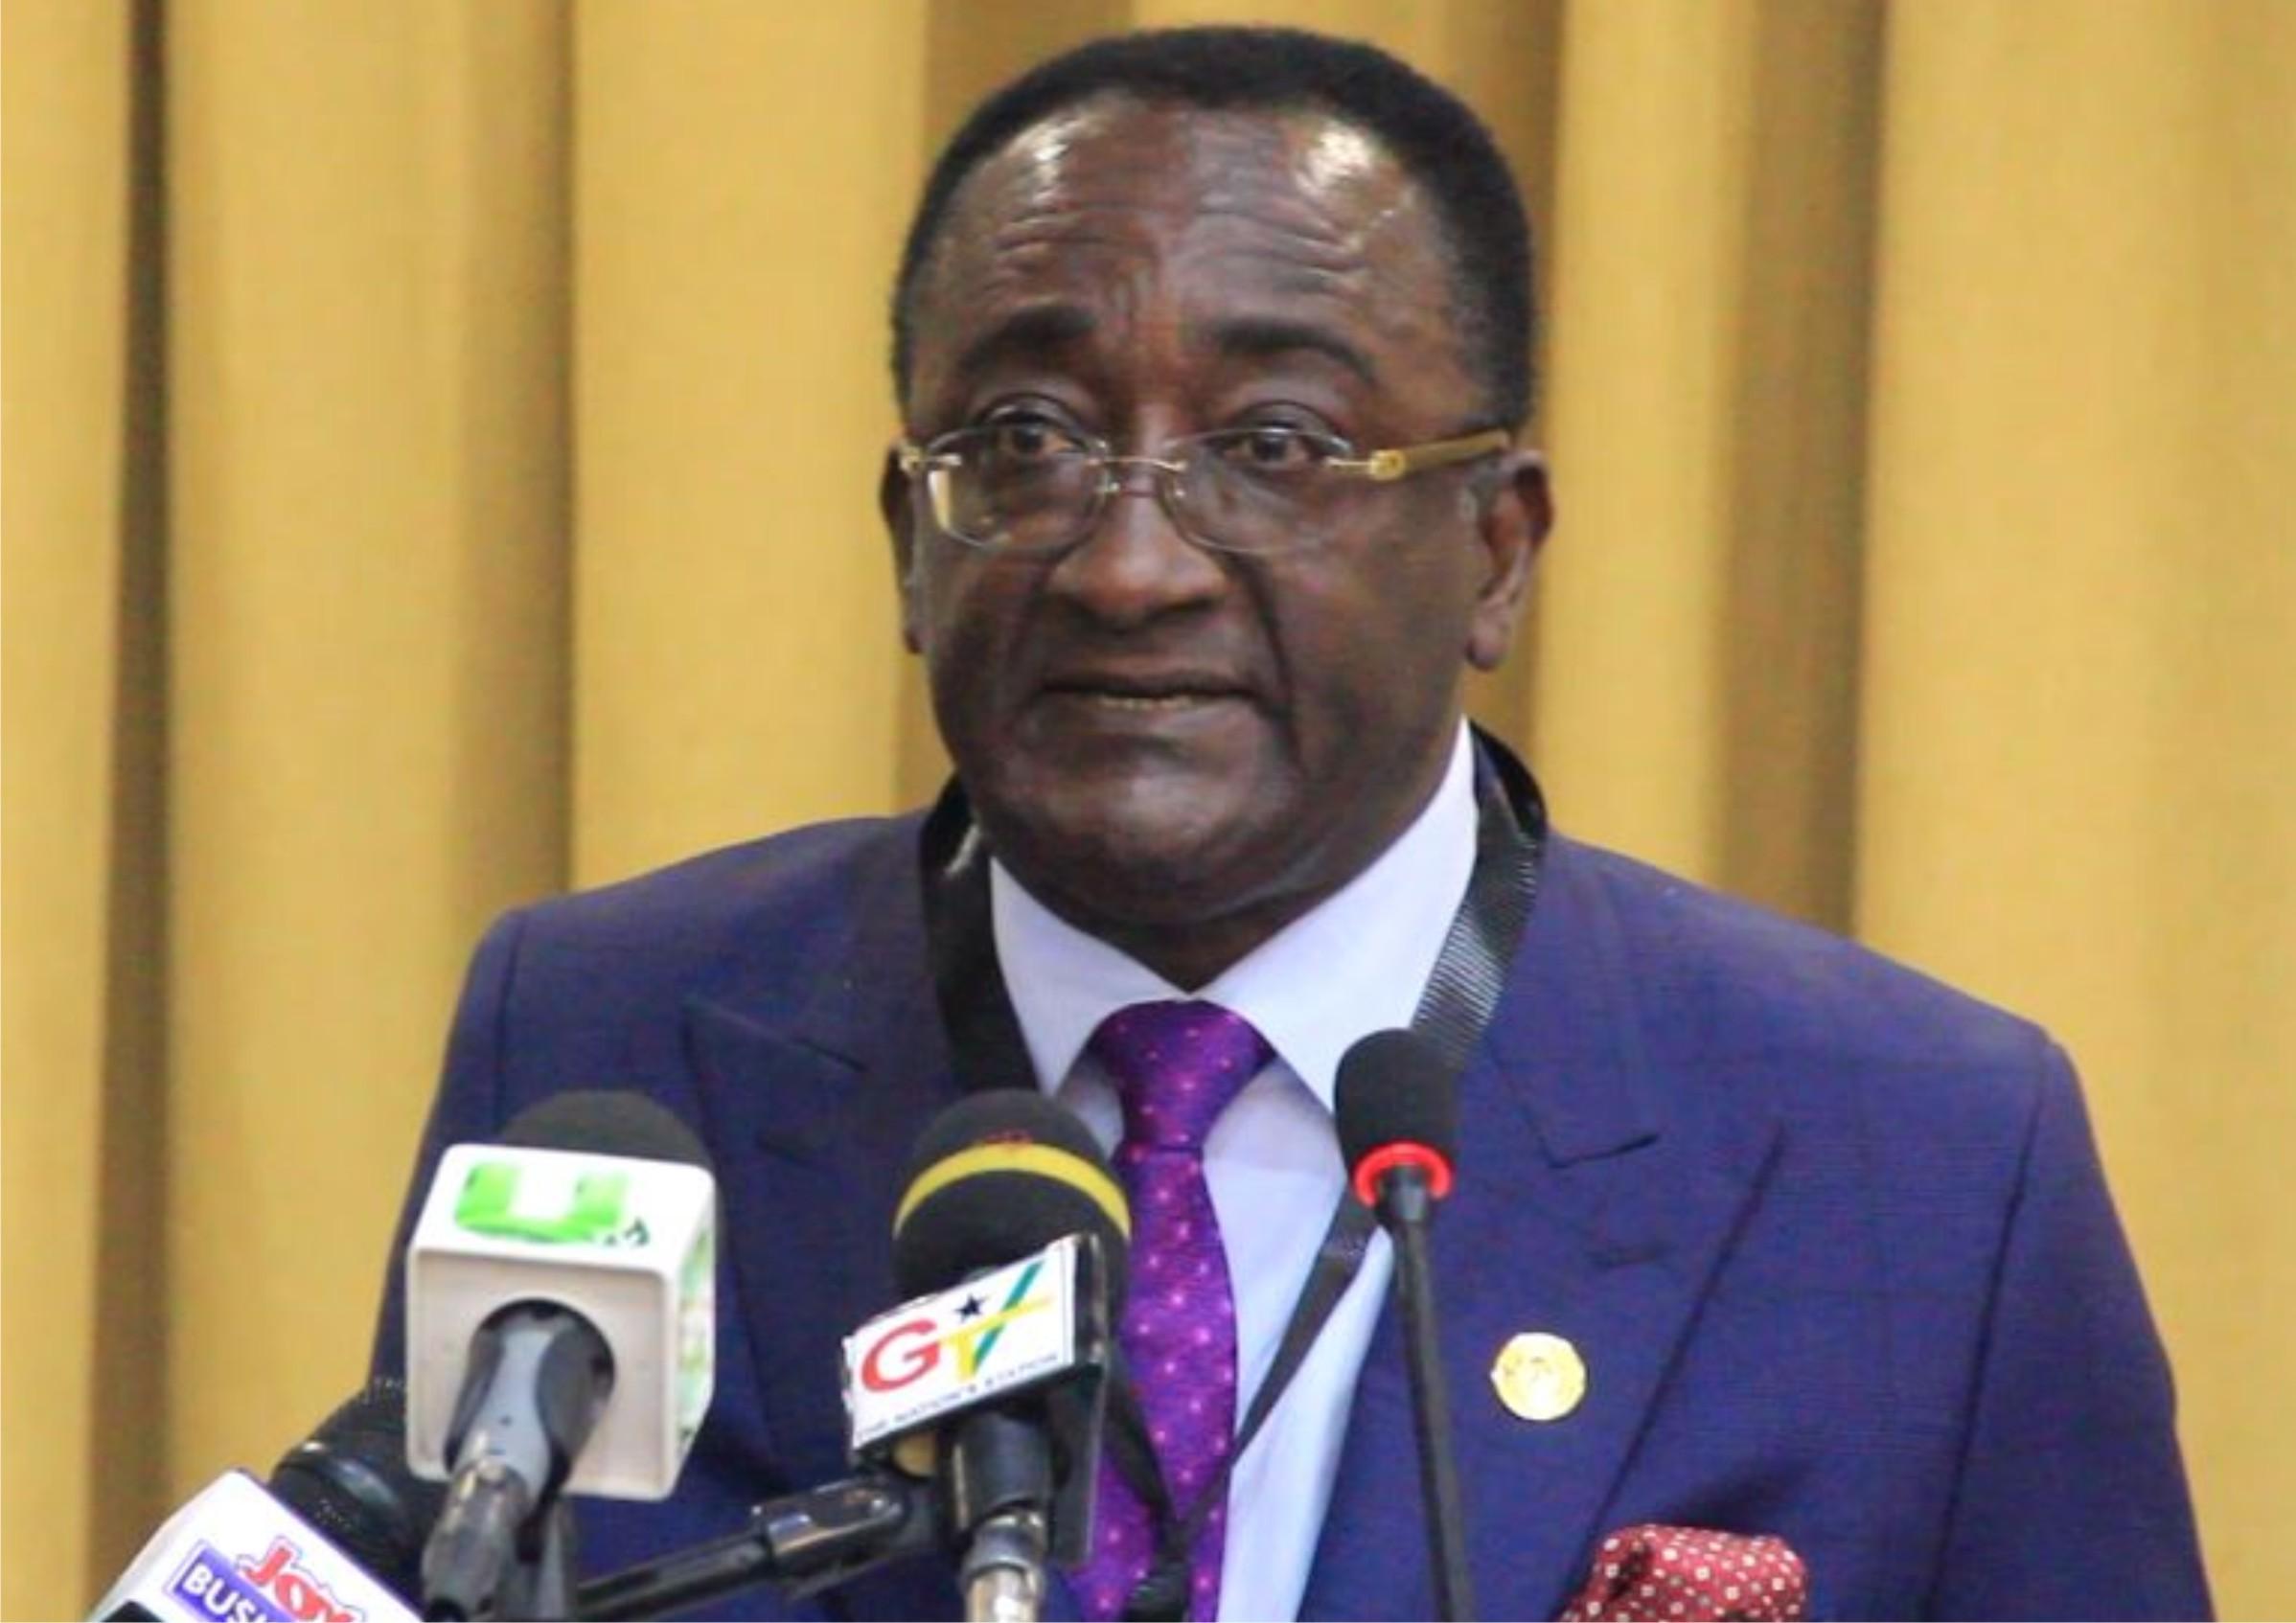 'NPP has neglected Ashanti Roads' – Dr. Afriyie Akoto. 46